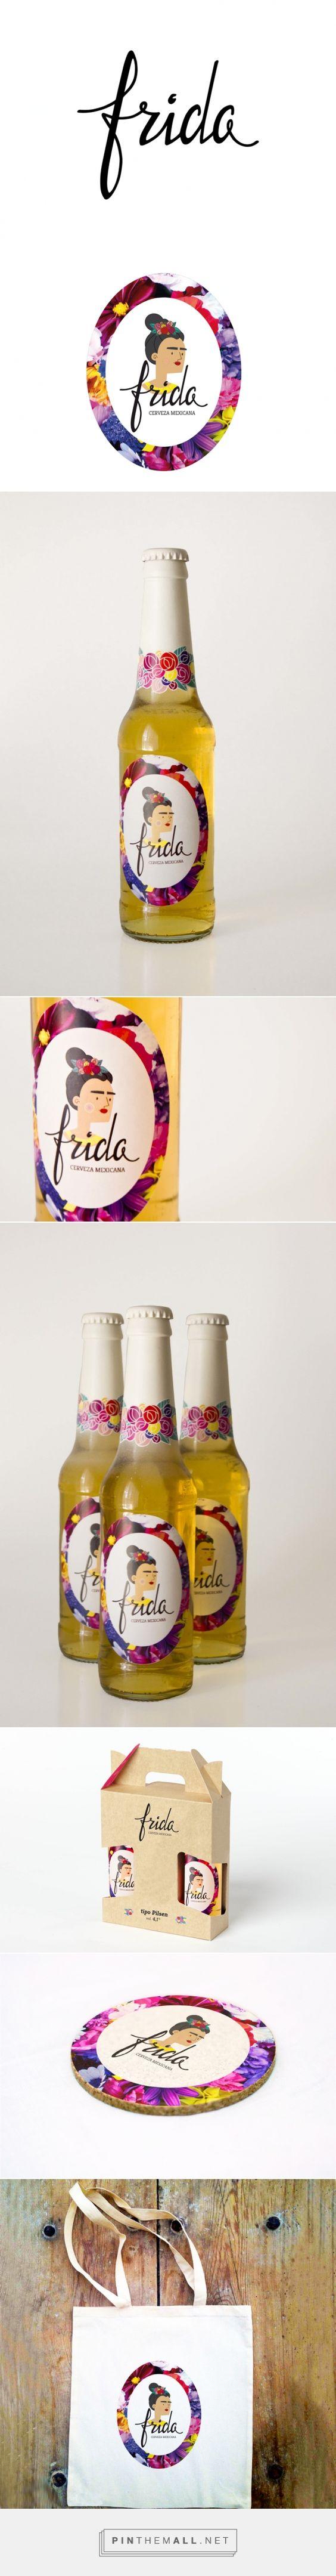 Frida, Cerveza Mexicana (con Elia Moliner) via Domestika curated by Packaging Diva PD